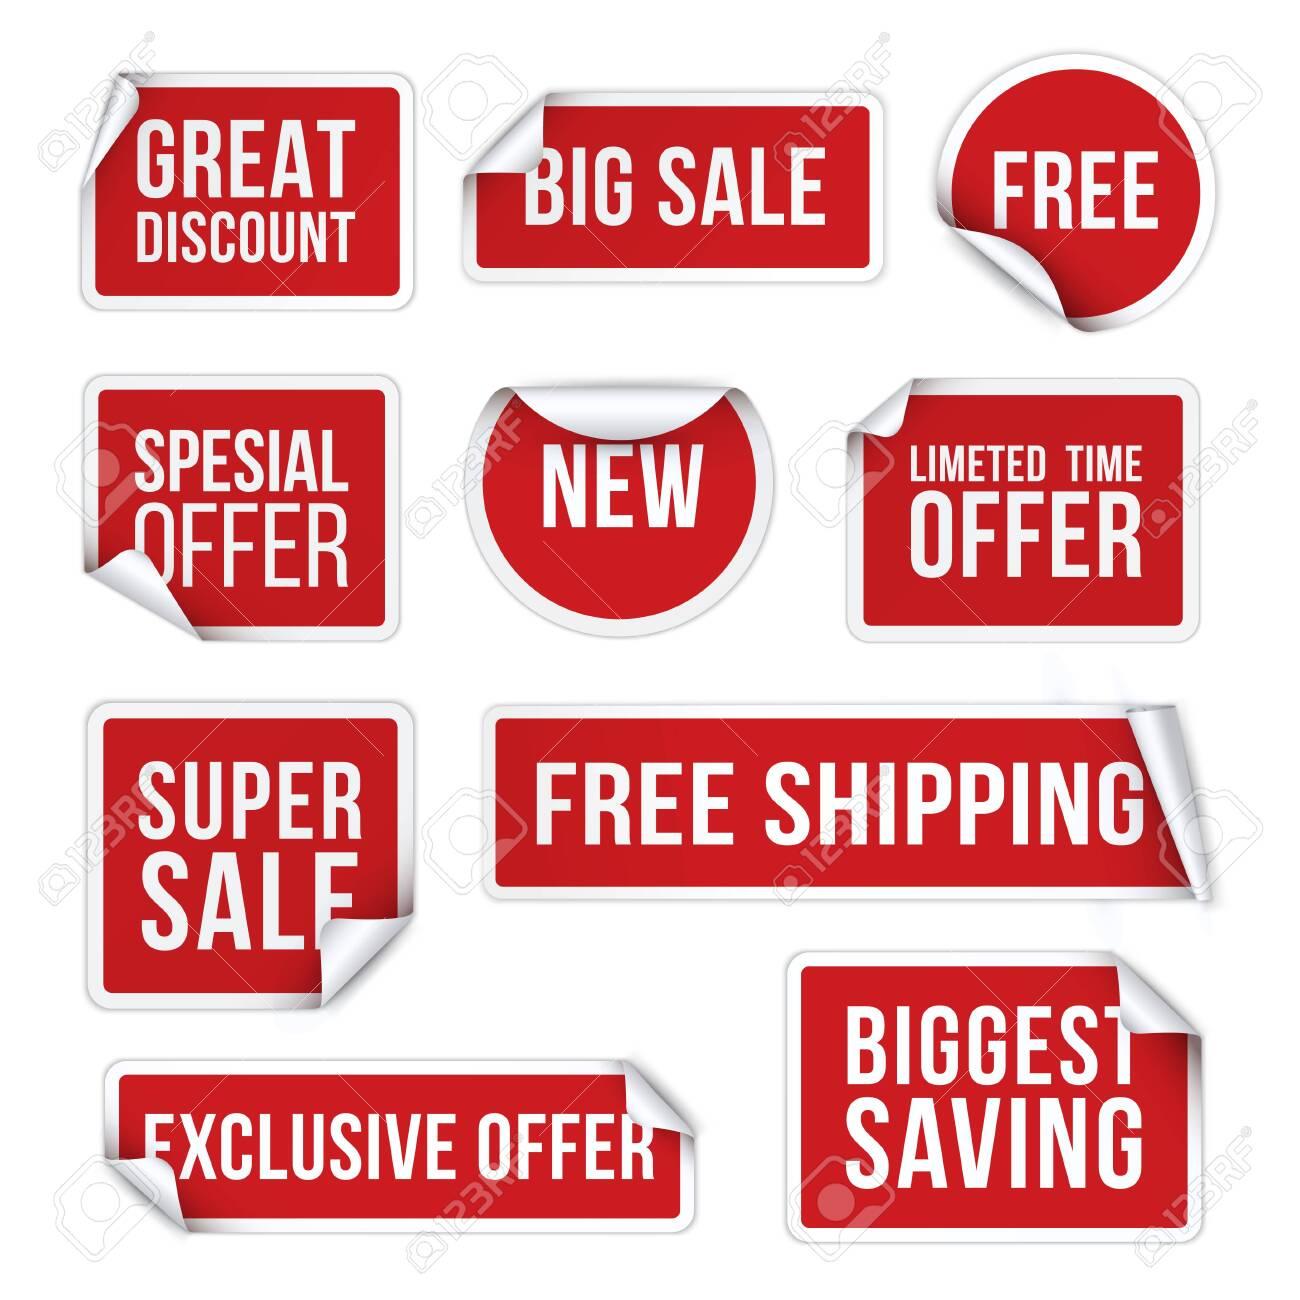 Sale stickers, promotional labels realistic vector illustration set - 133292972